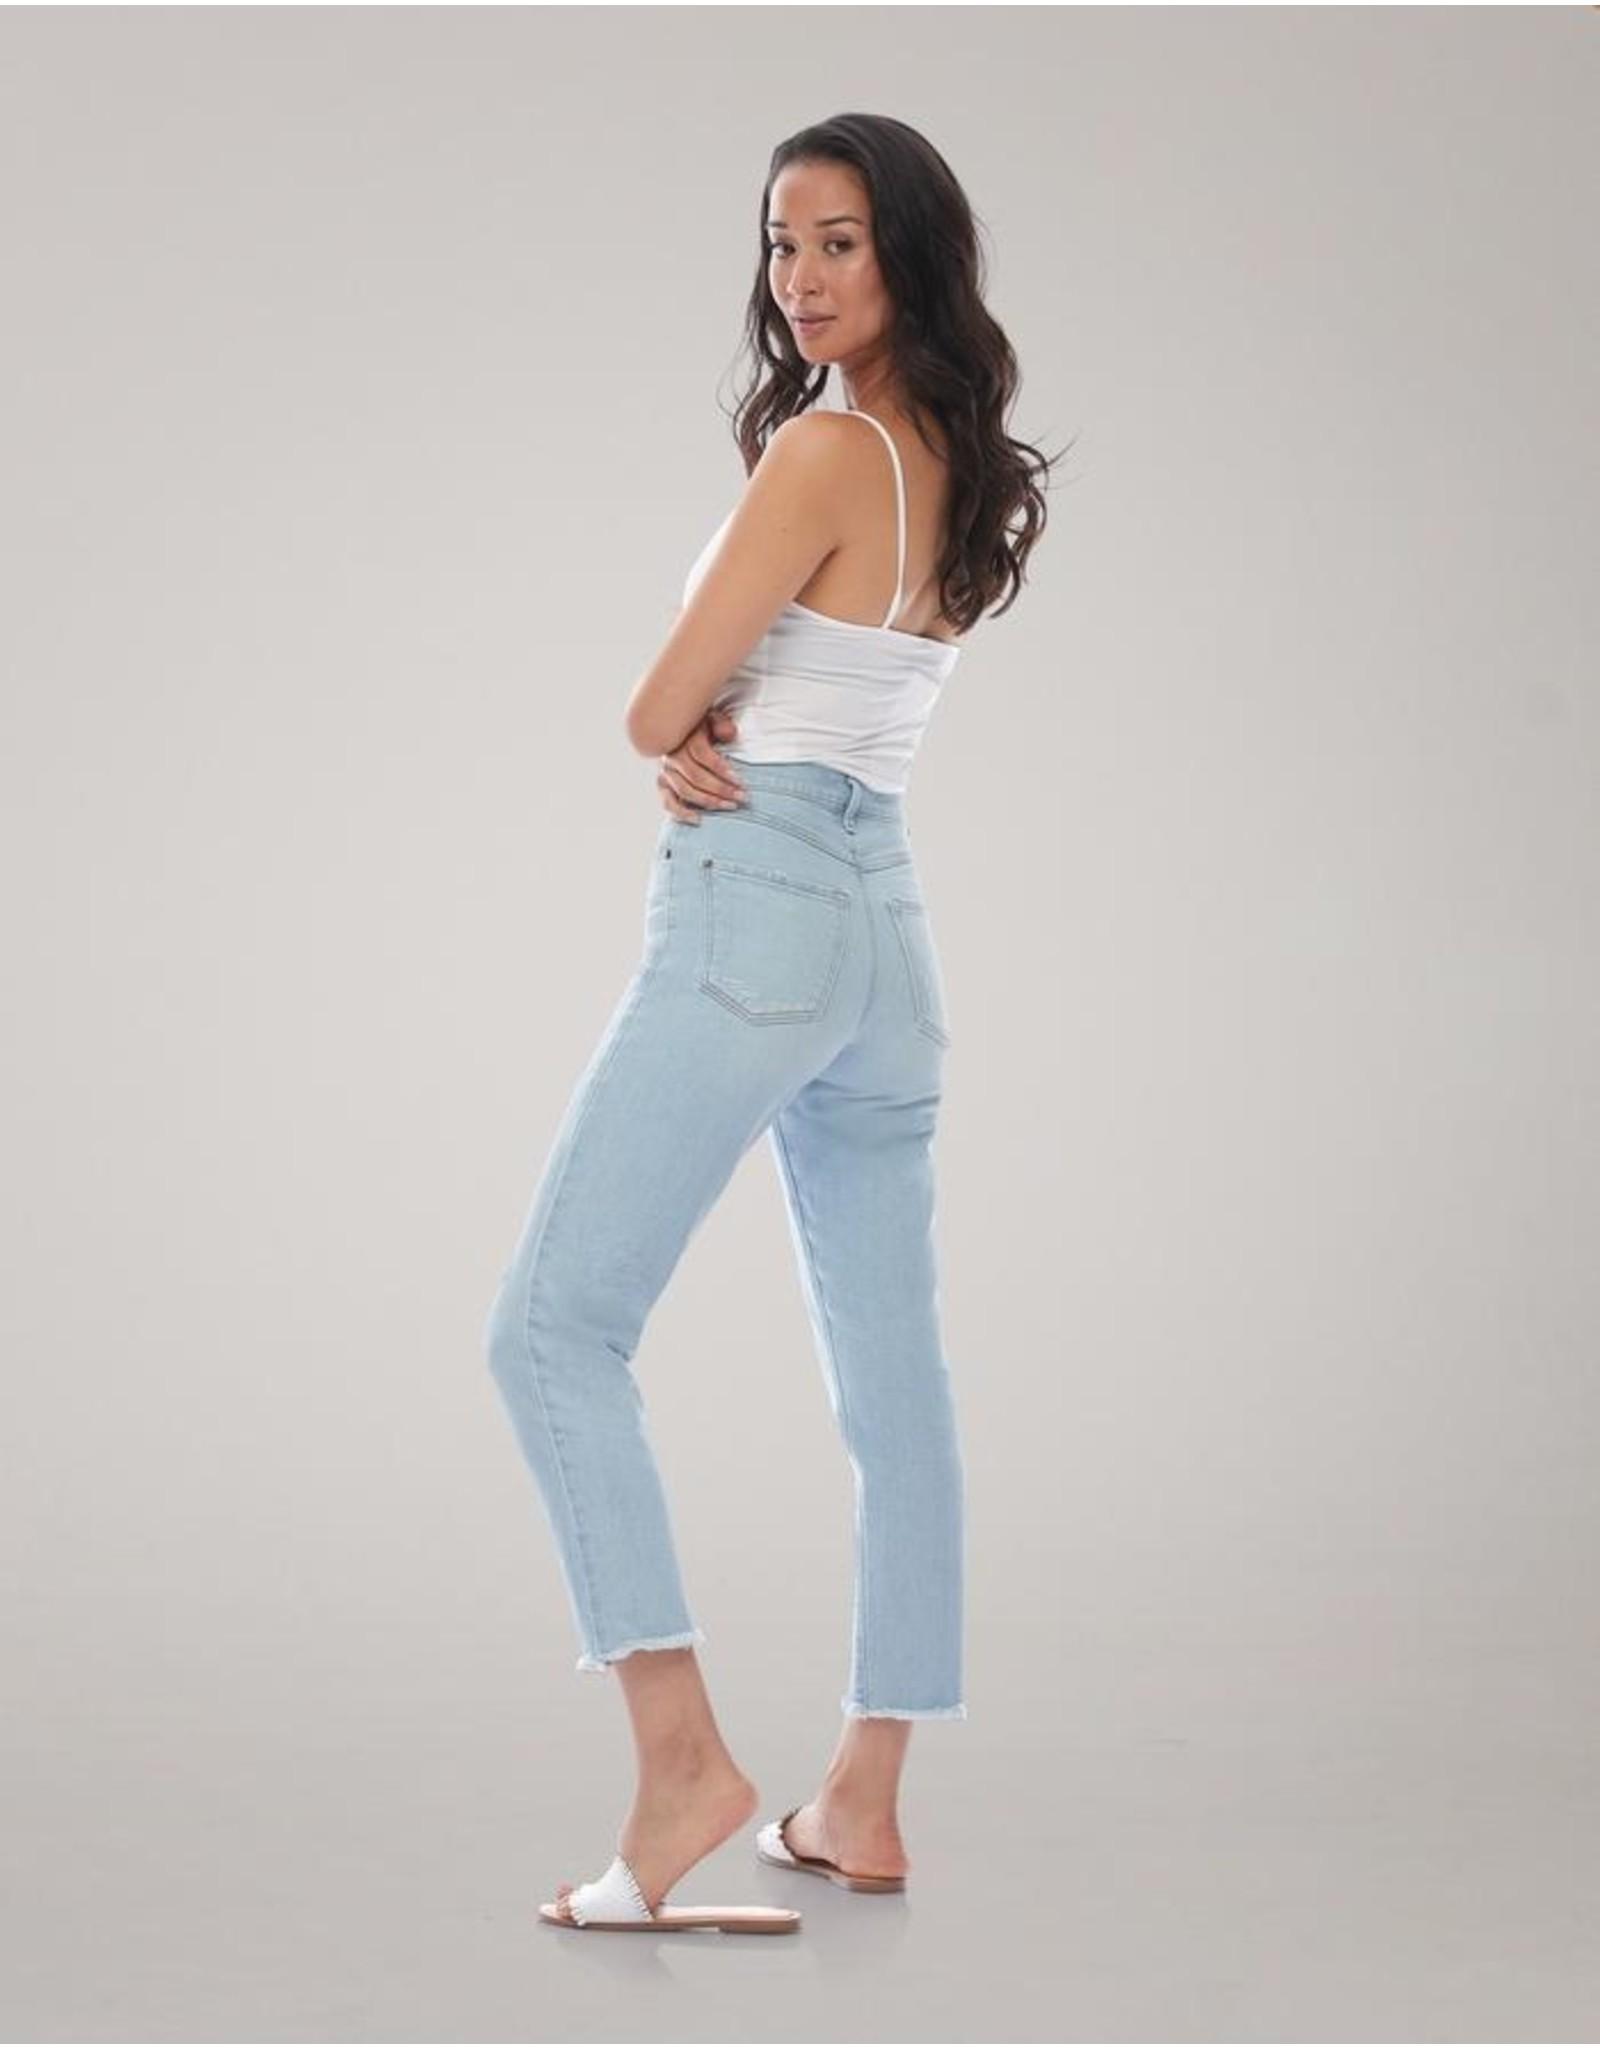 Yoga Jeans - Emily Slim - Cyclone